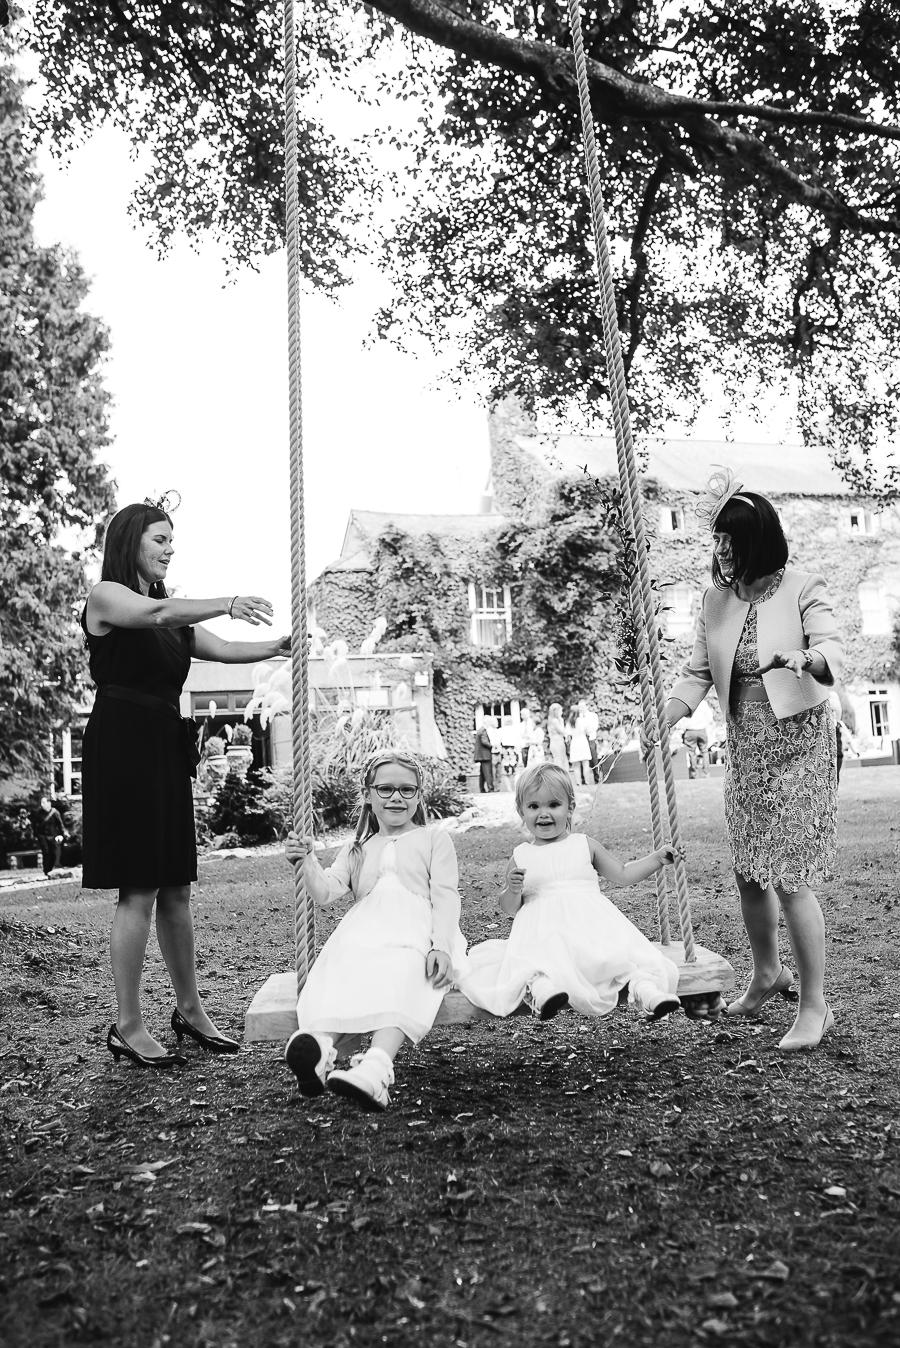 OurBeautifulAdventure-FairyhillWedding-John&Zoe-WeddingBlog-2-6.jpg